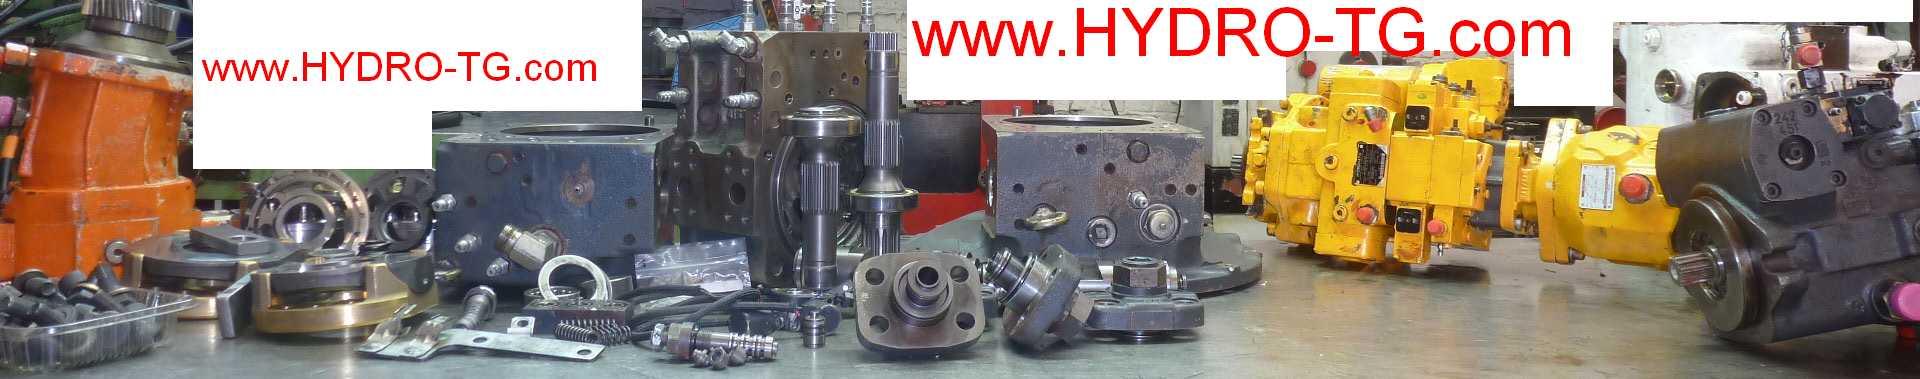 rexroth-a4v-a4vg-a6vm-komatsu-pompe-hydraulique